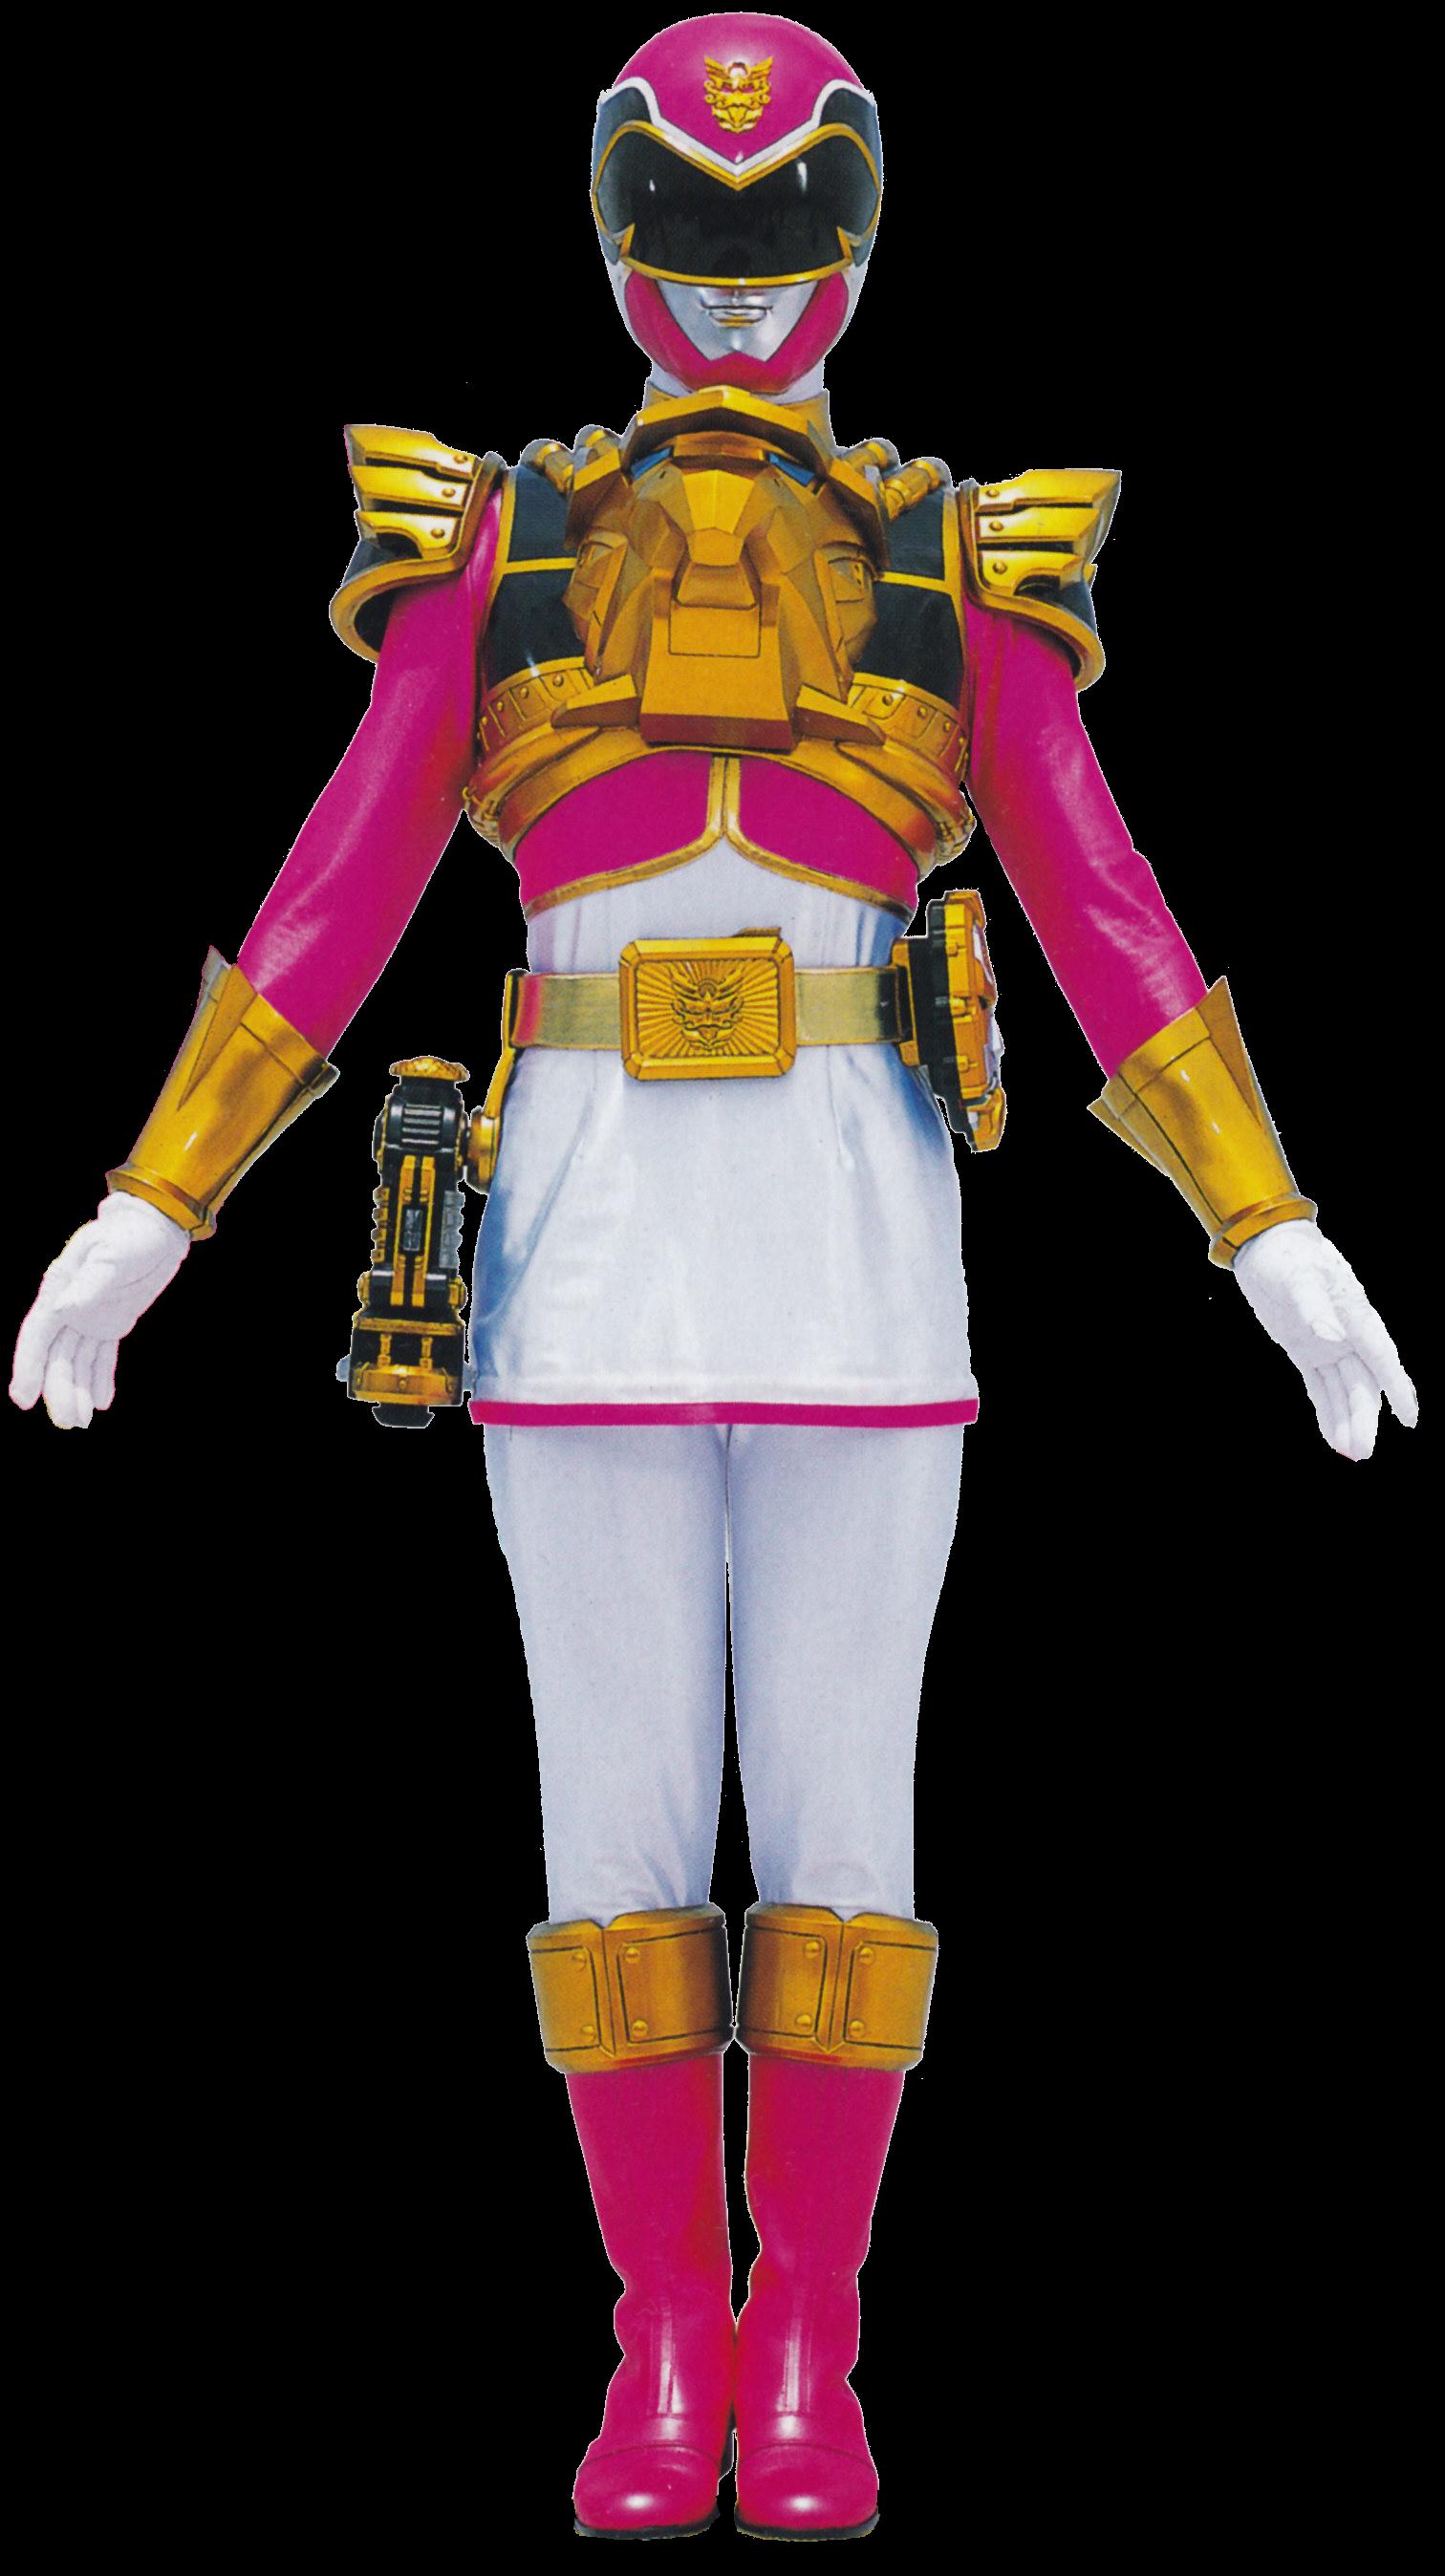 Power Rangers Super Megaforce Navy Ranger Tokusatsu